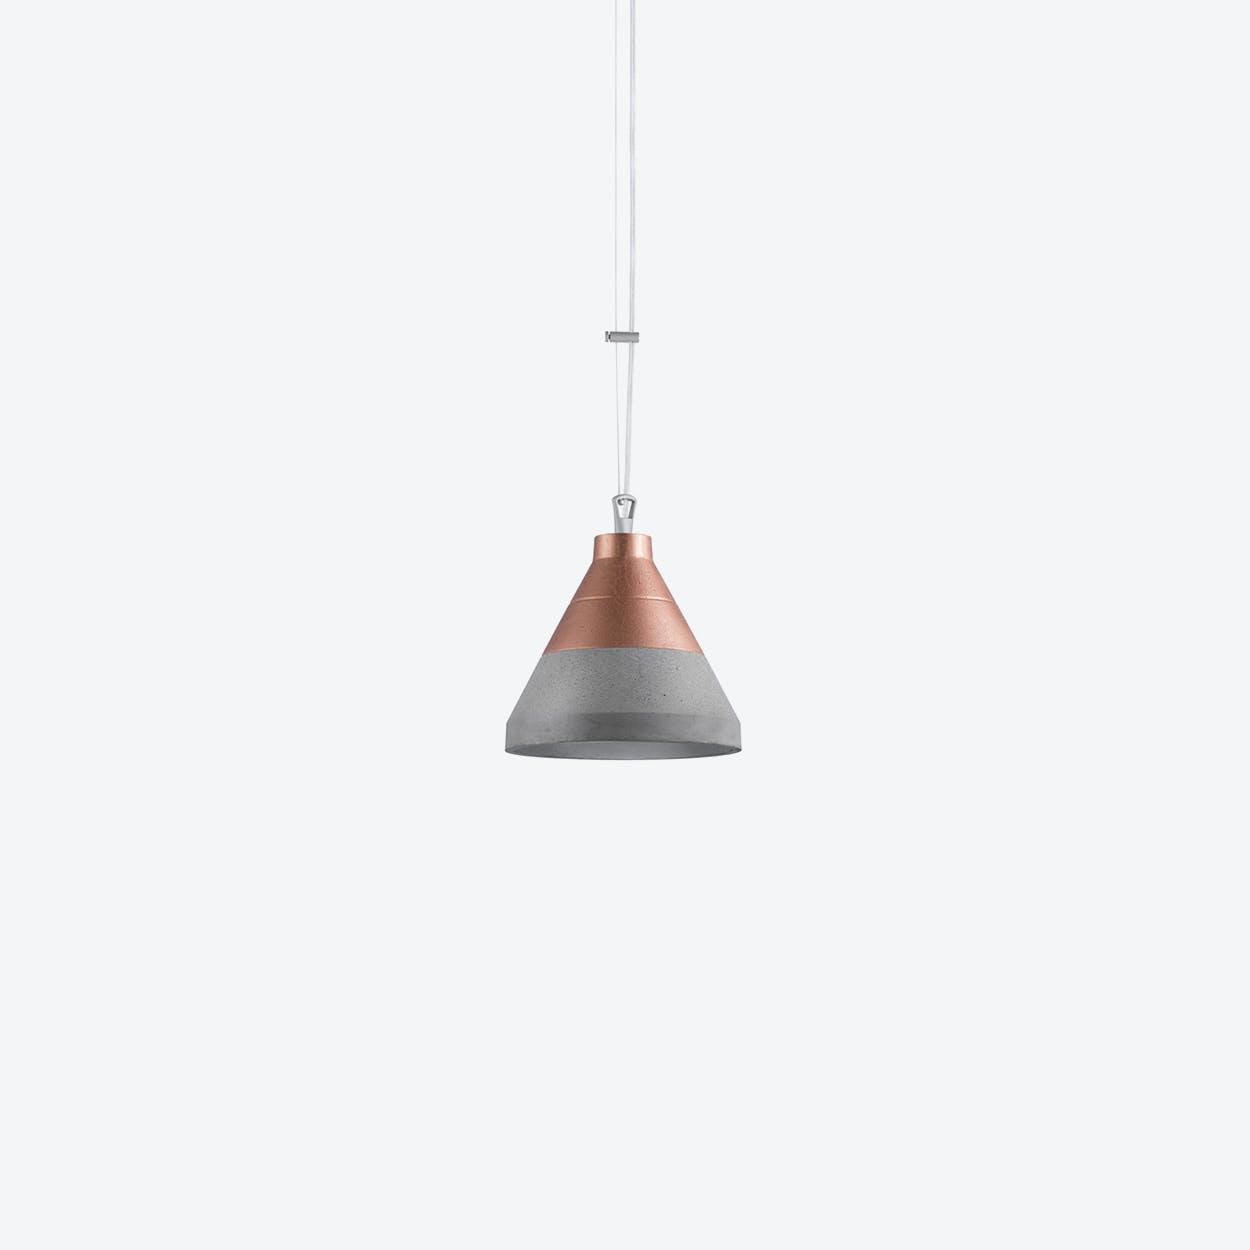 Craft Pendant Lamp in Copper / Up